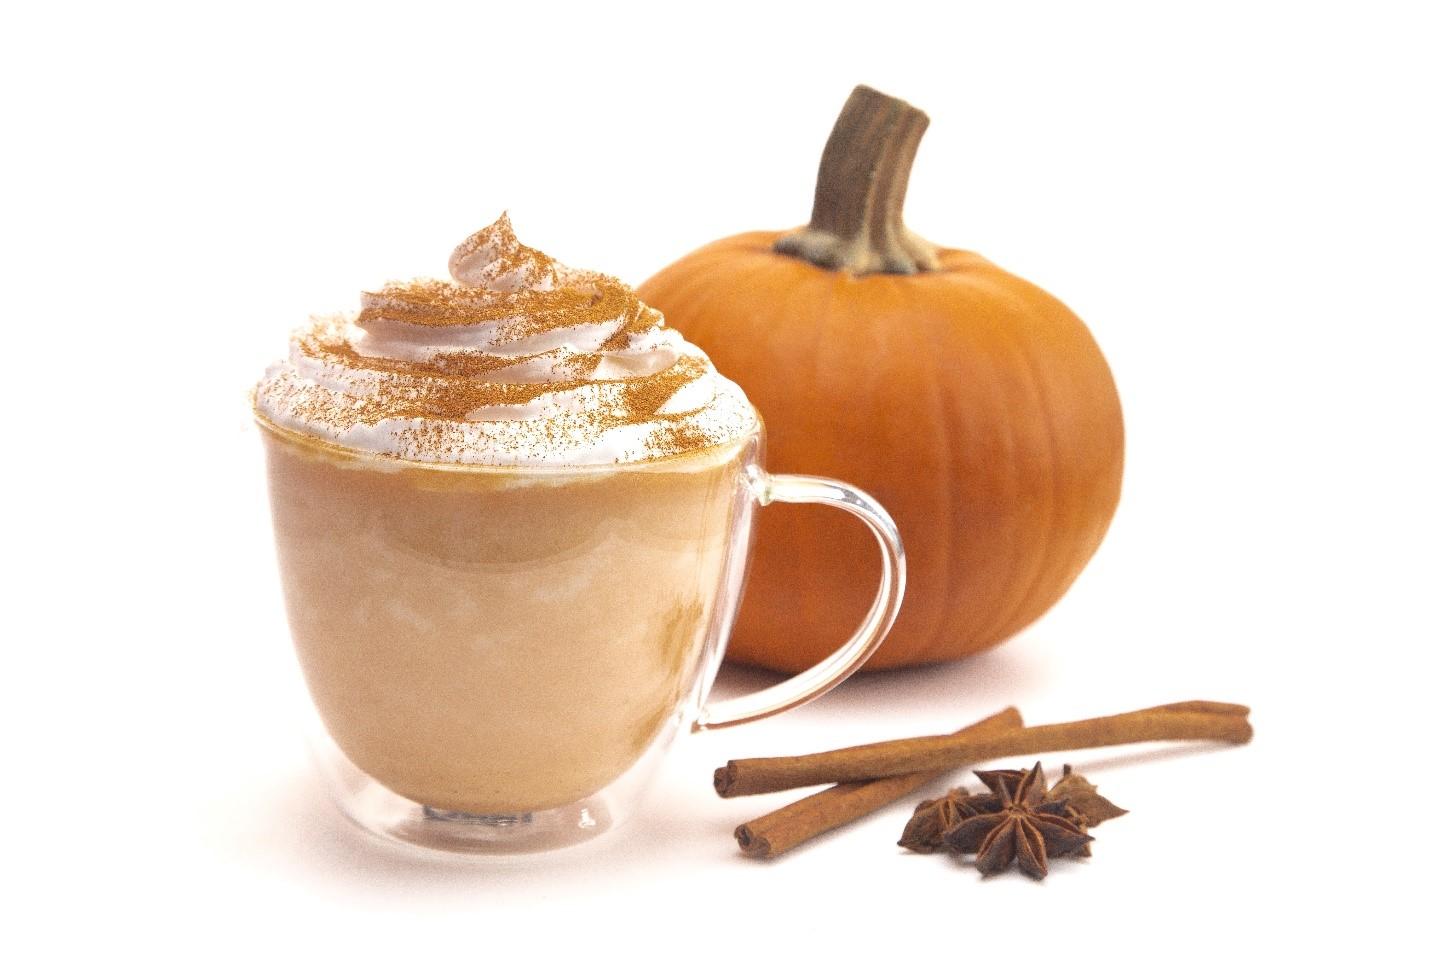 Pumpkin-spice-latte-a-hot-drink-that-can-damage-teeth ...